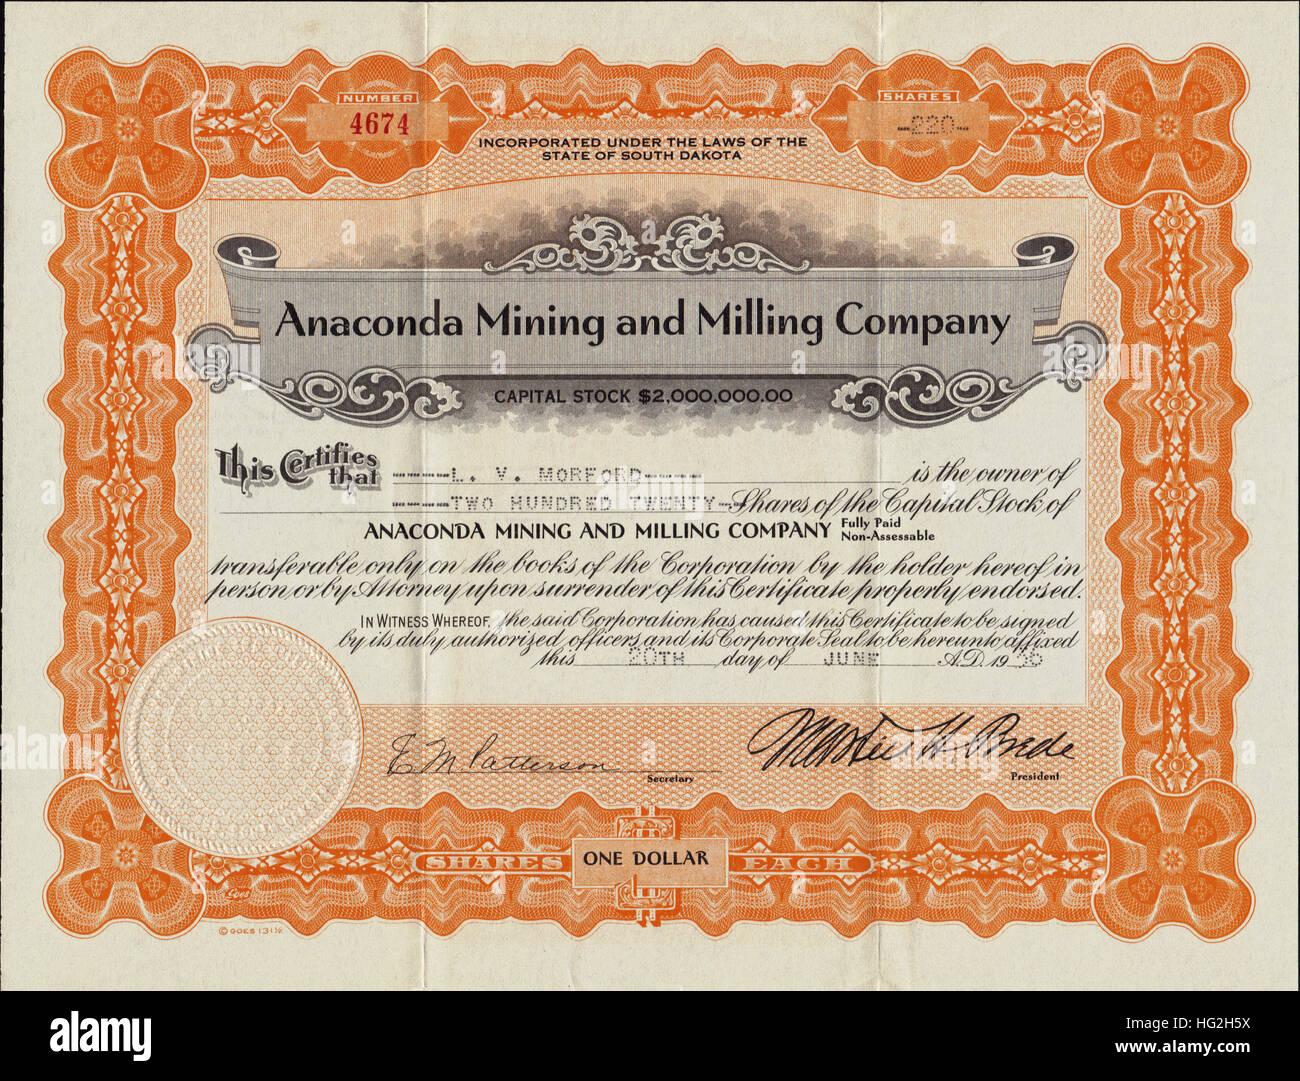 1936 Anaconda Mining and Milling Company Stock Certificate - Deadwood, South Dakota - USA - Stock Image